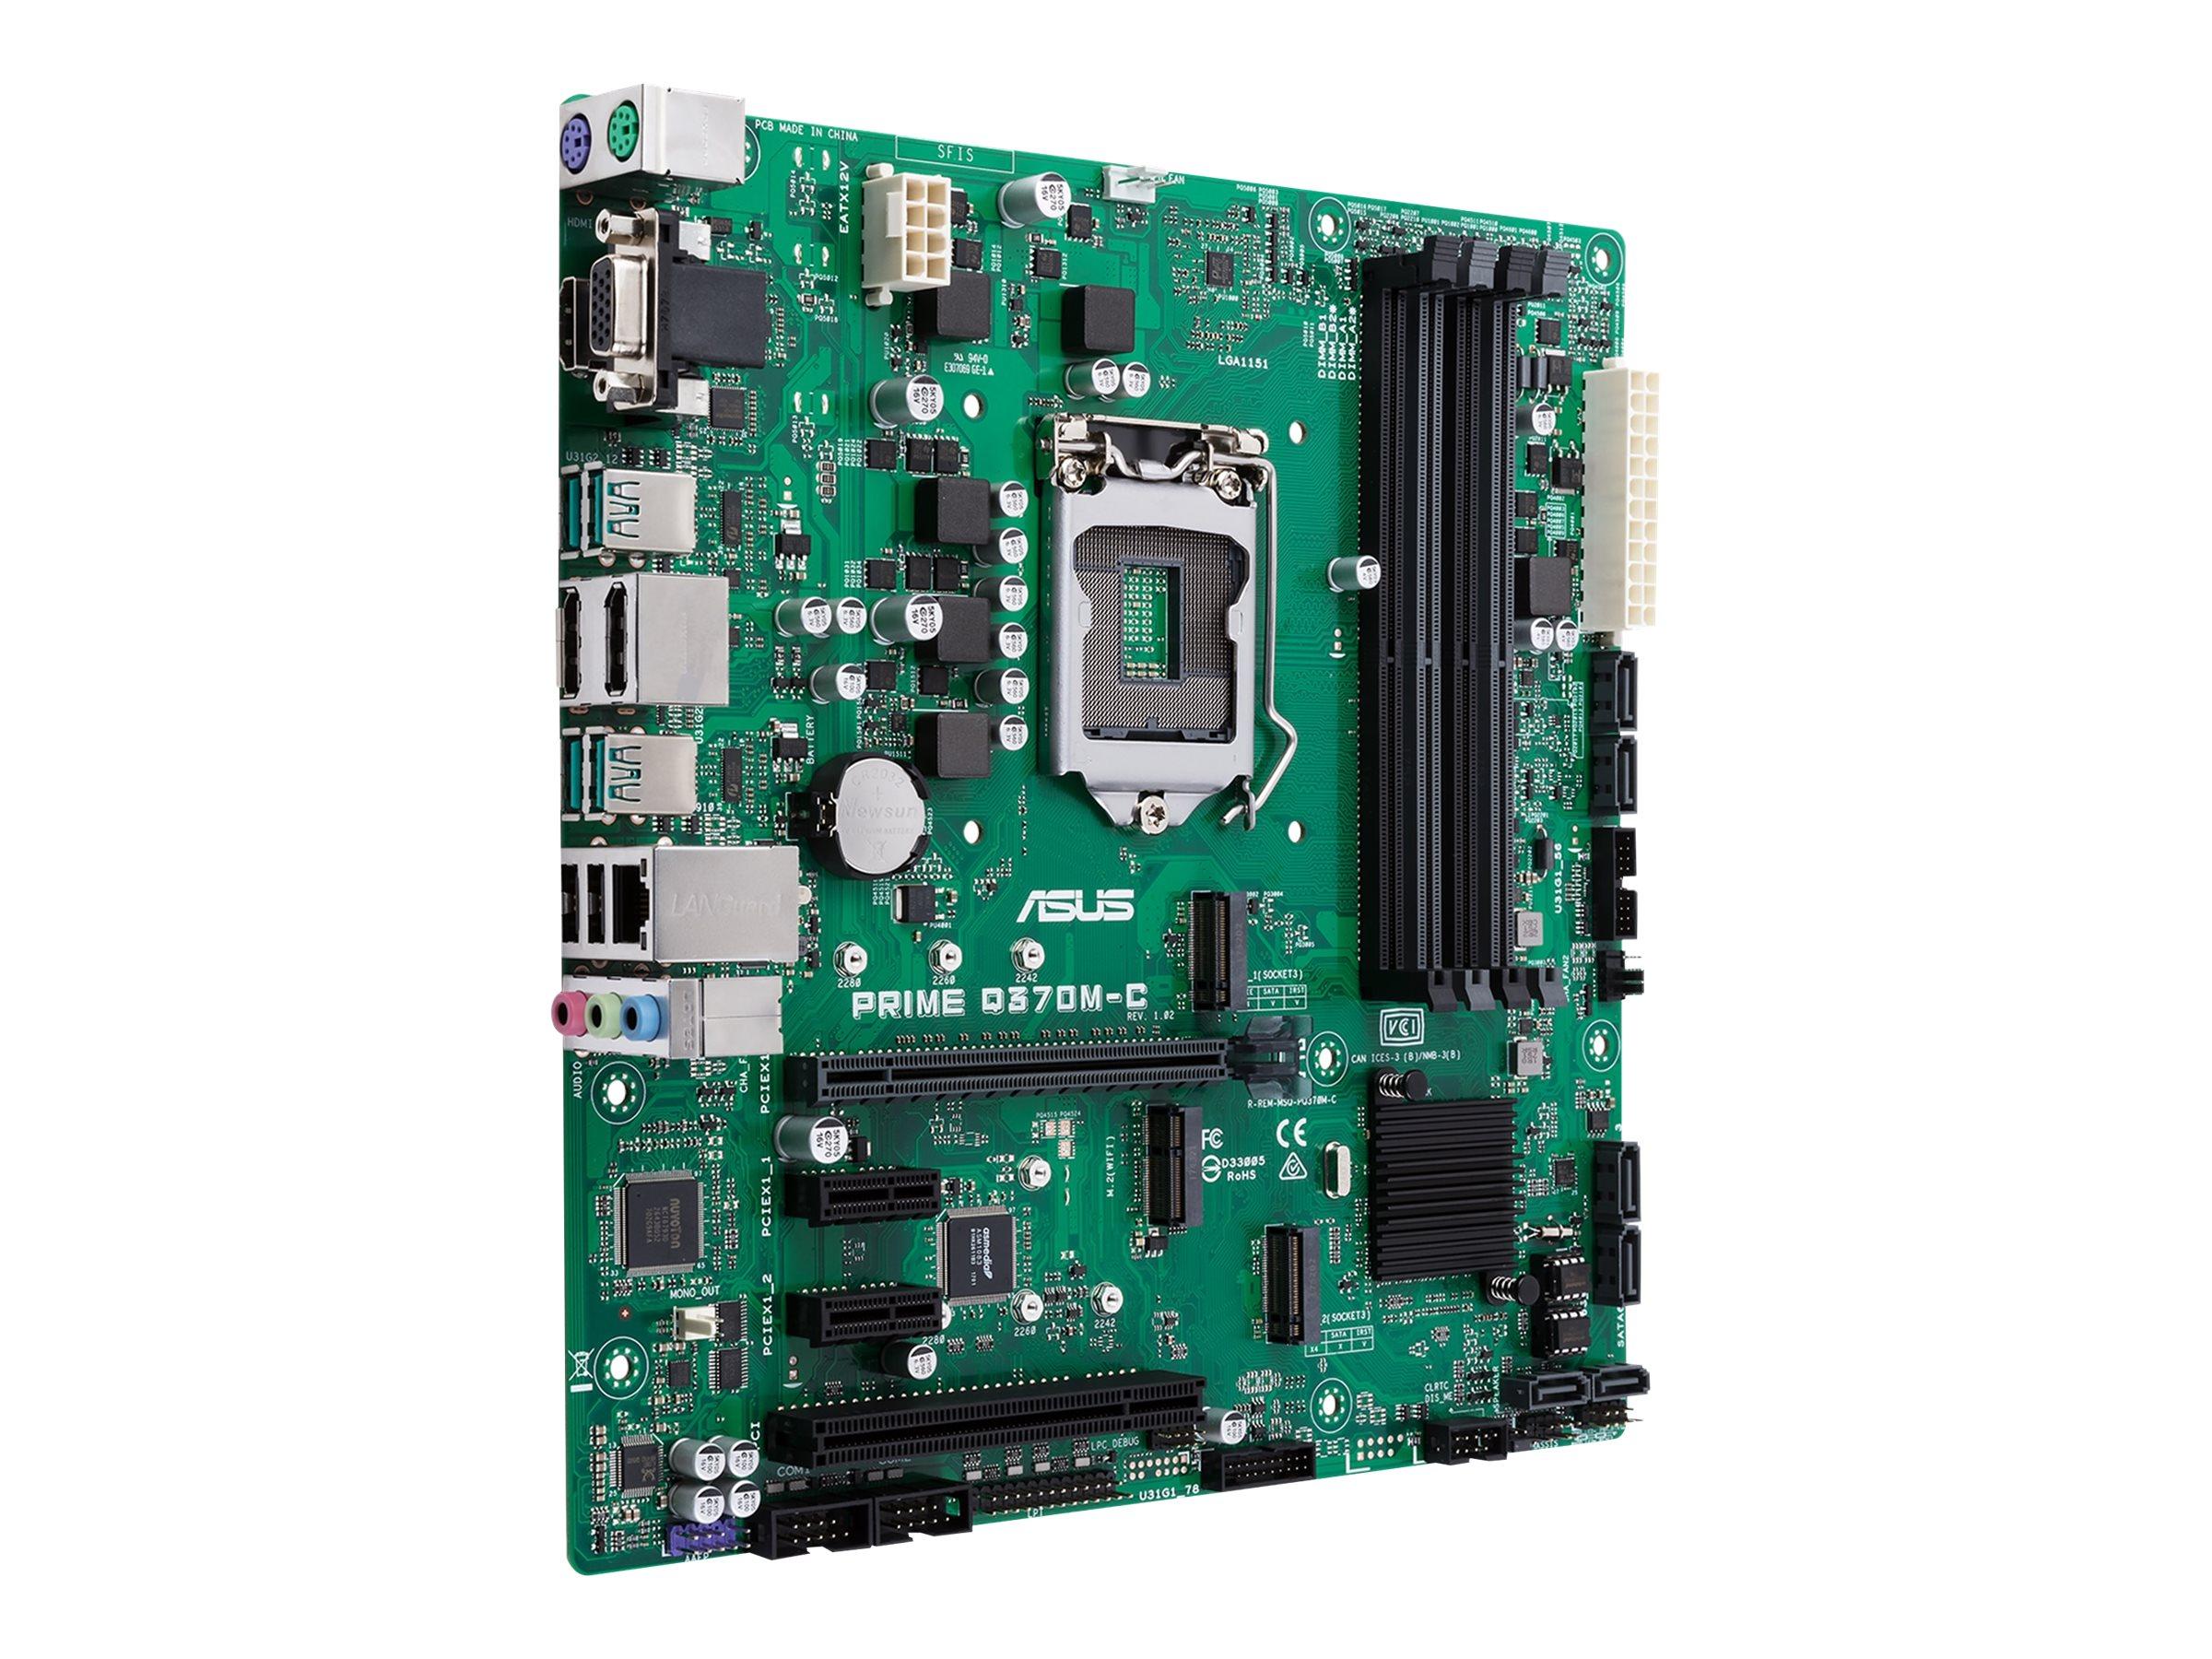 ASUS PRIME Q370M-C - Motherboard - micro ATX - LGA1151 Socket - Q370 - USB 3.1 Gen 1, USB 3.1 Gen 2 - Gigabit LAN - Onboard-Grafik (CPU erforderlich)